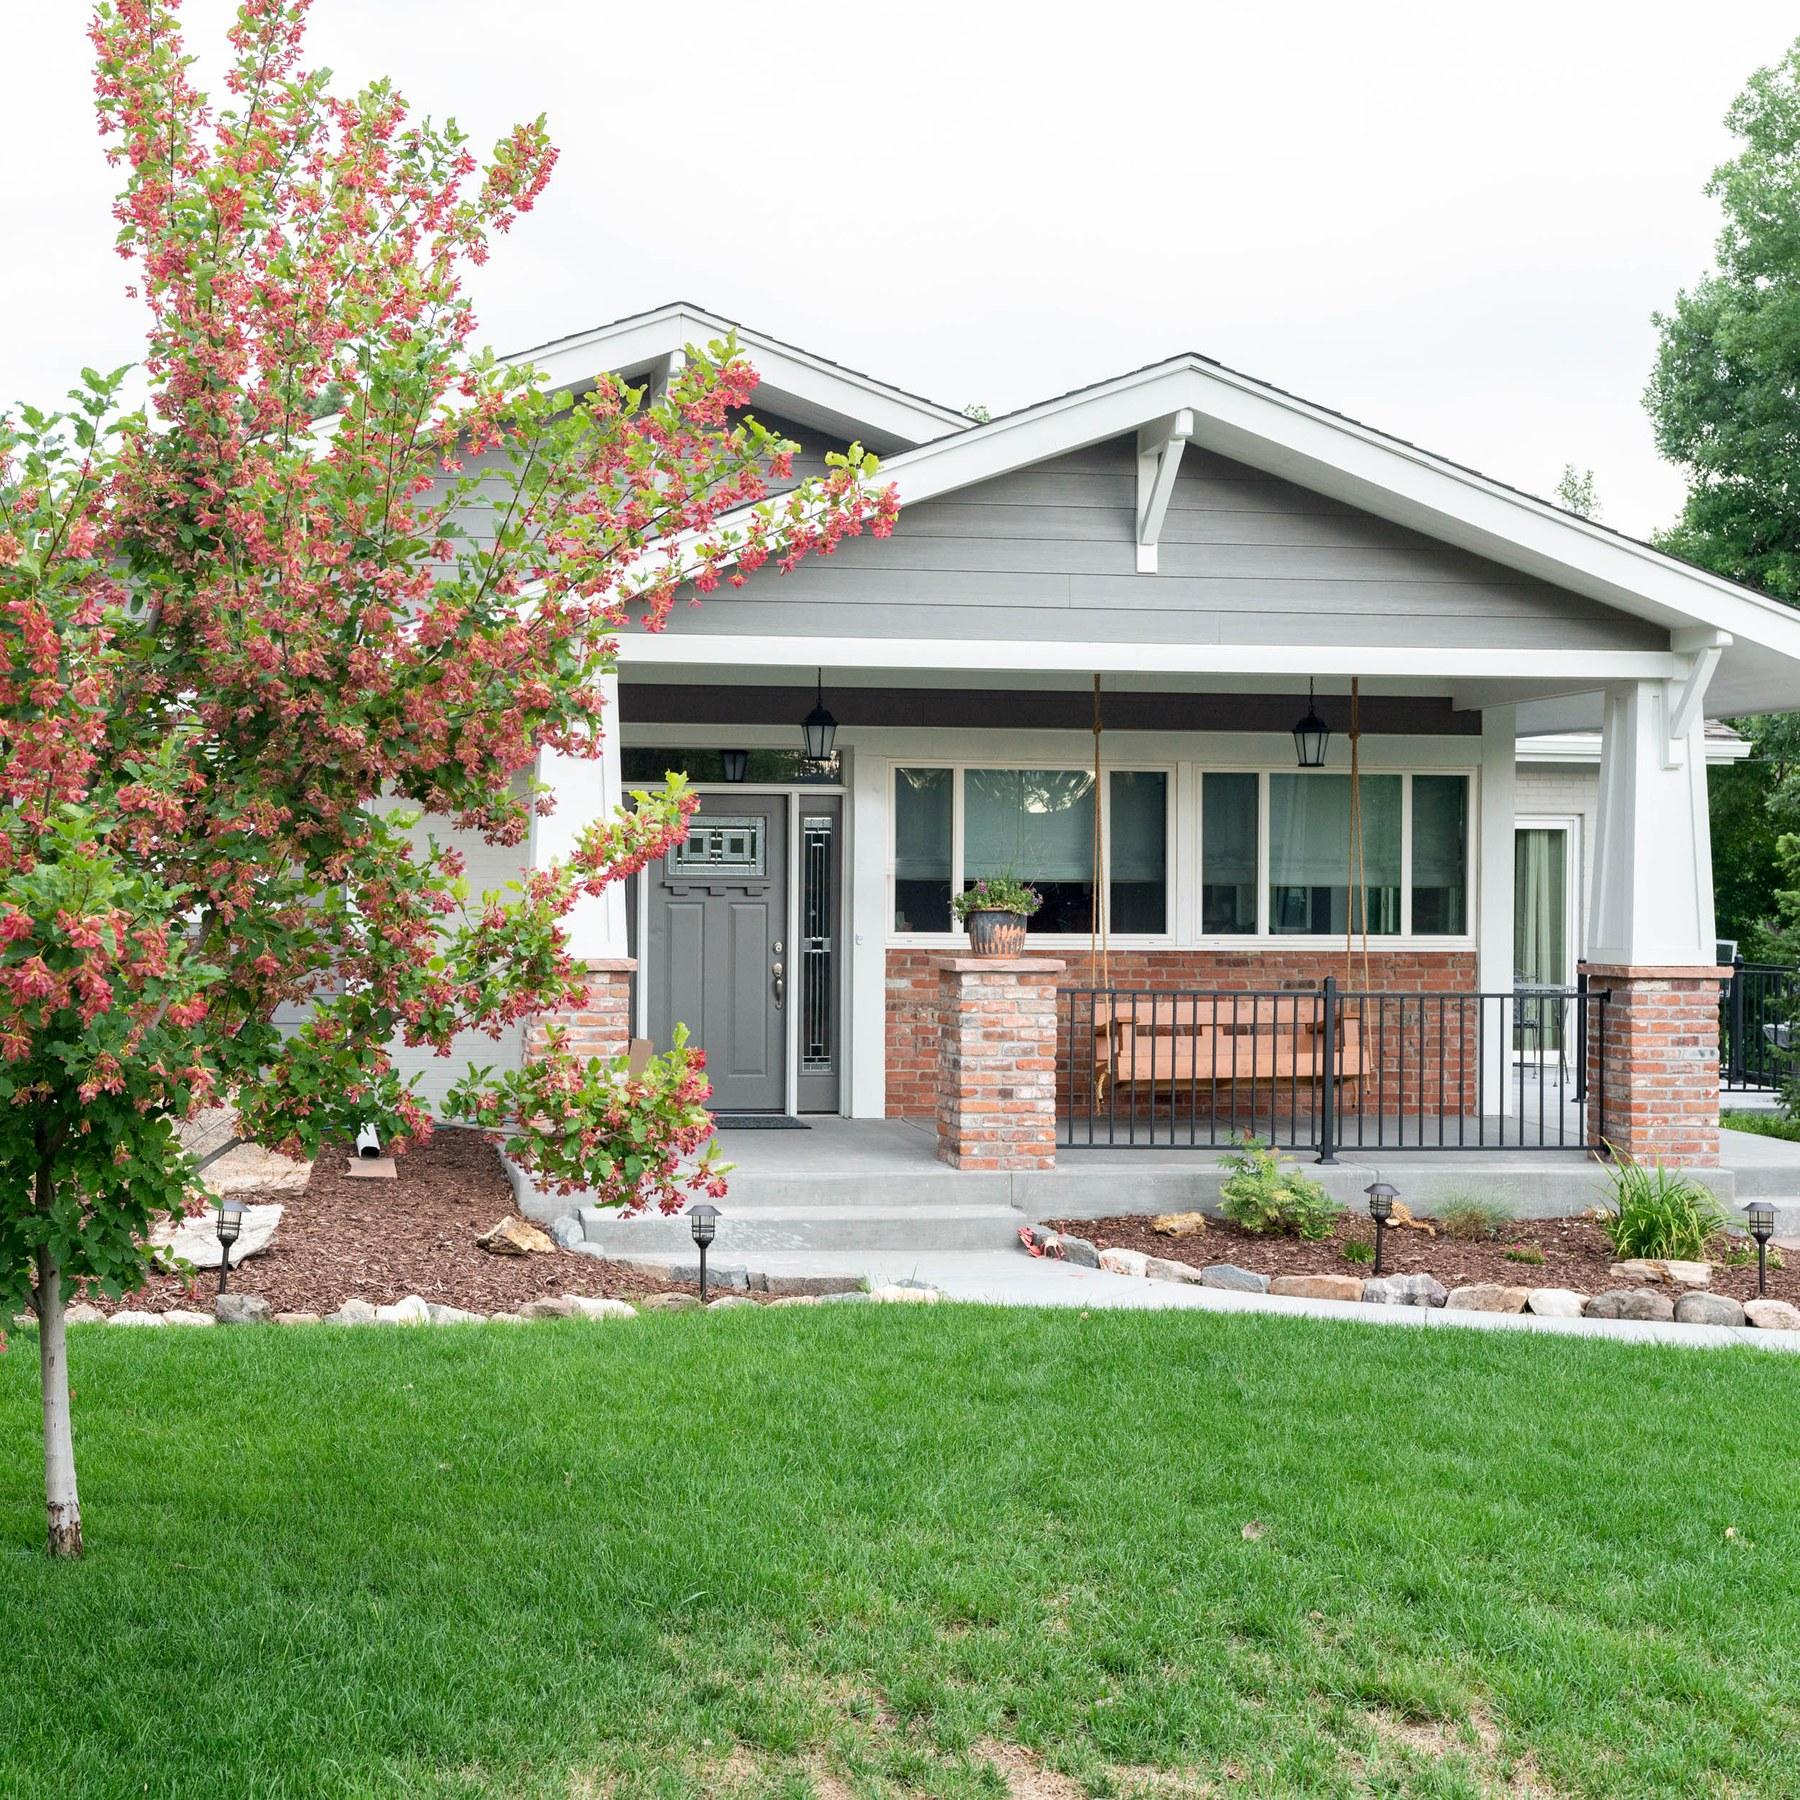 Local Com Homes For Rent: Two Creeks, Lakewood CO - Neighborhood Guide